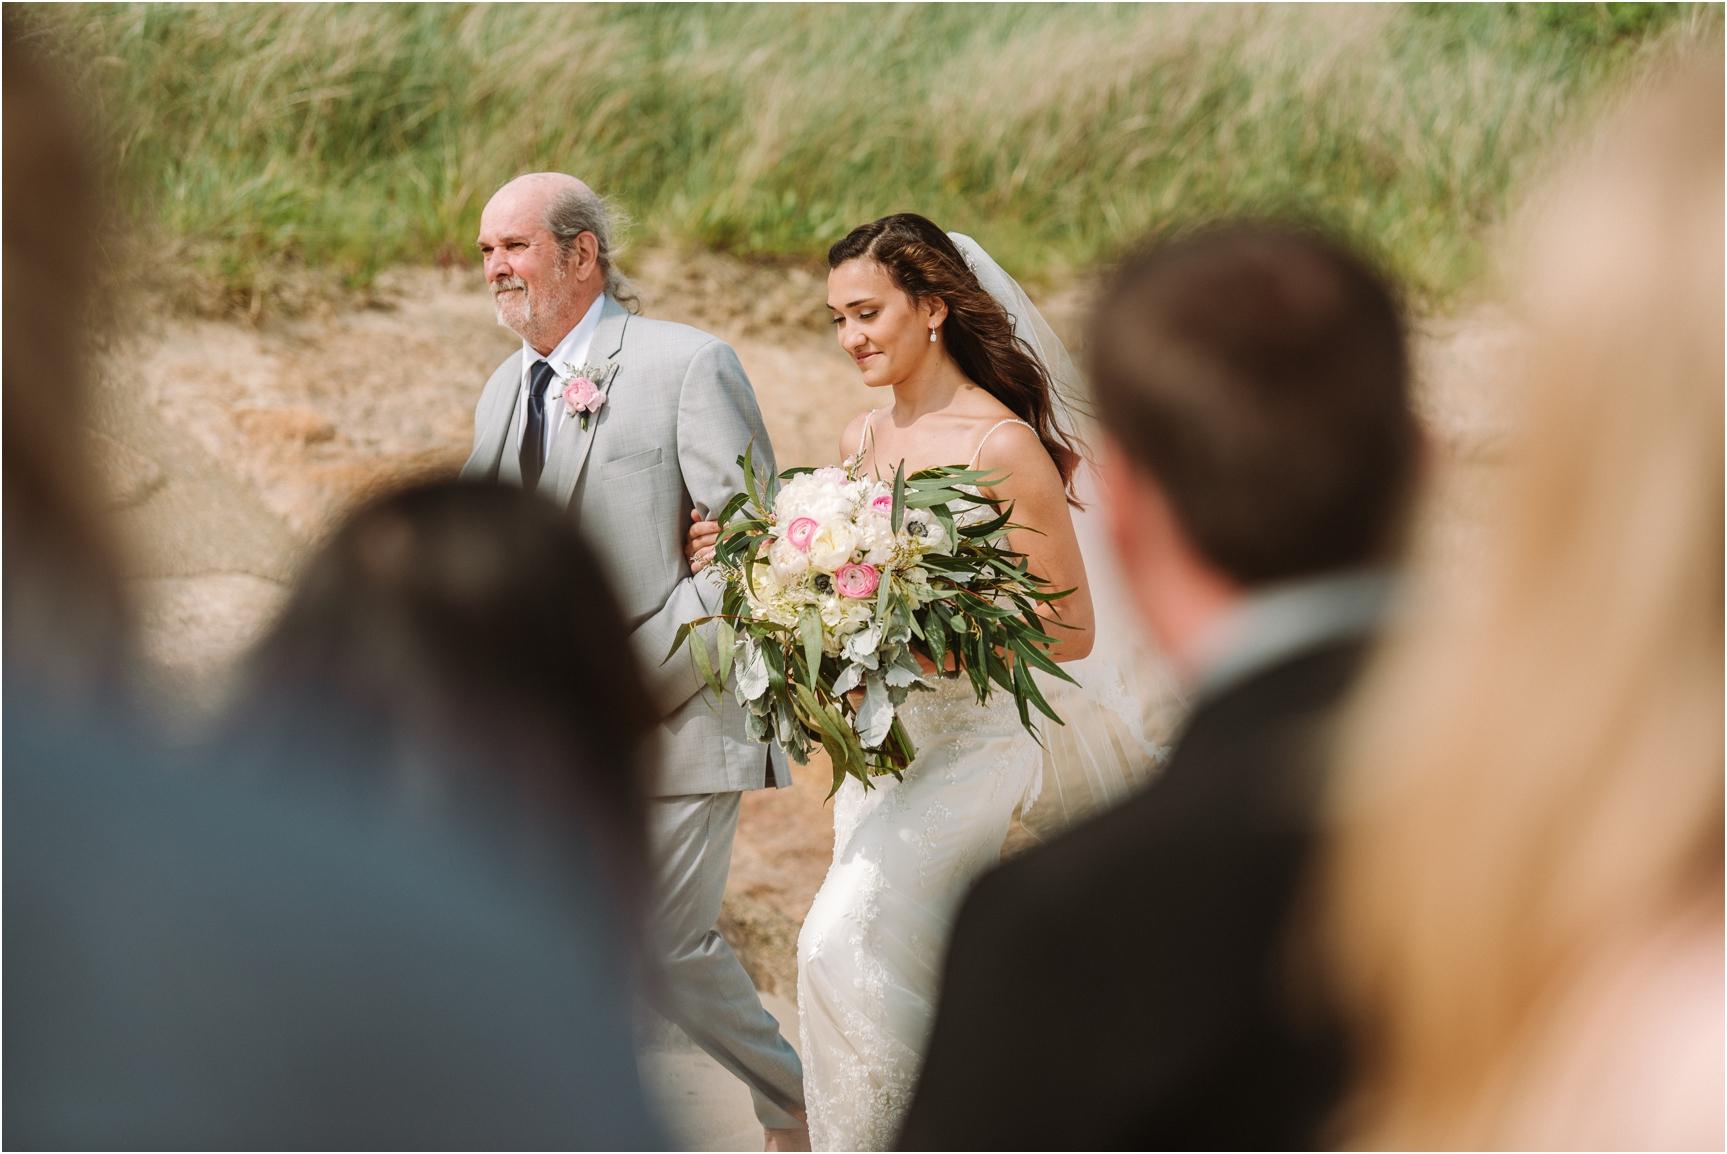 Sarah & Sam Pelham House Cape Cod Wedding Photographer-89.jpg